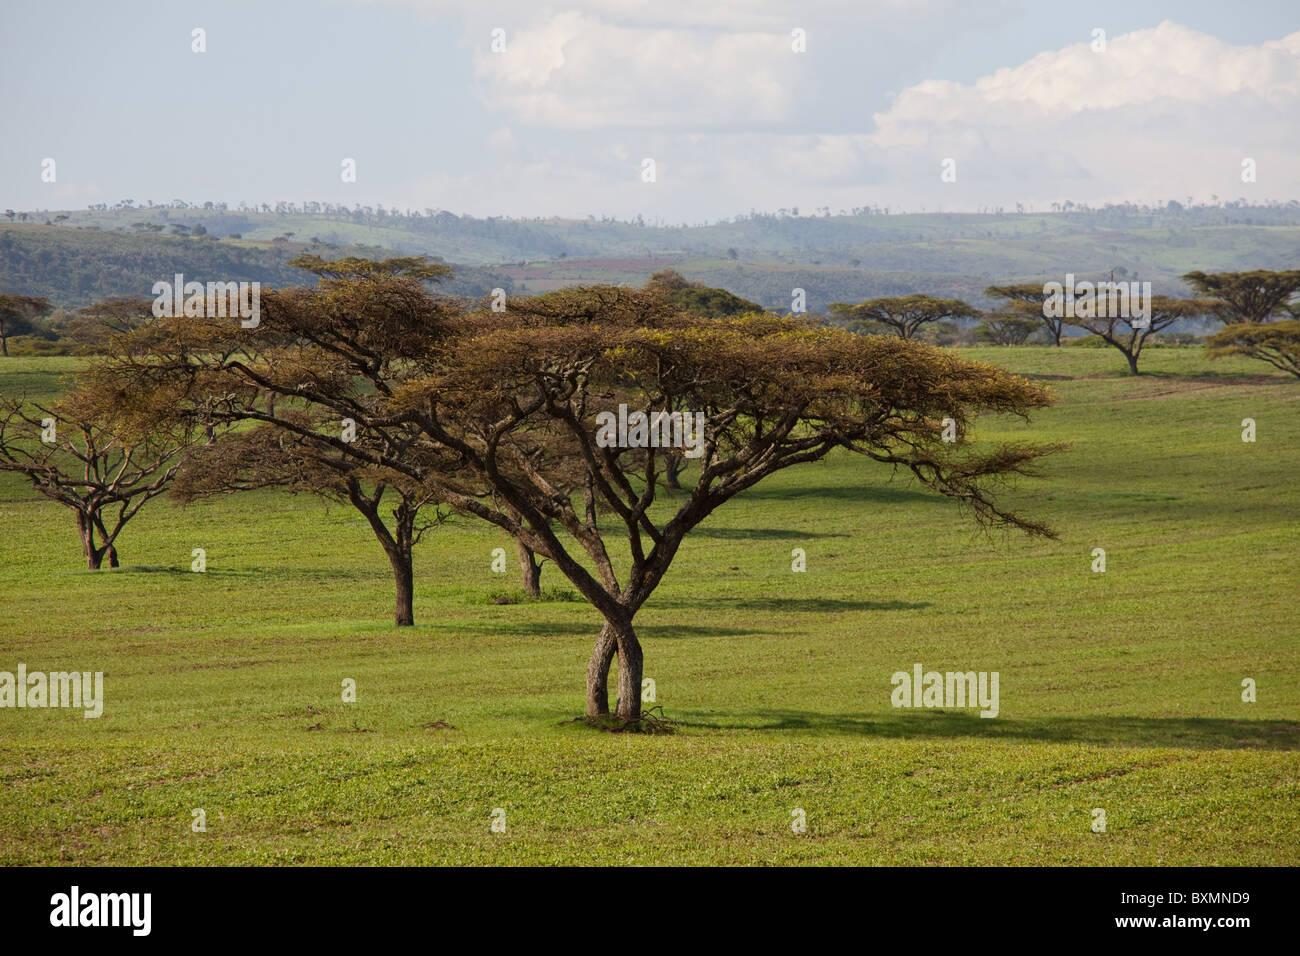 Paesaggi africani. Kenya. Immagini Stock